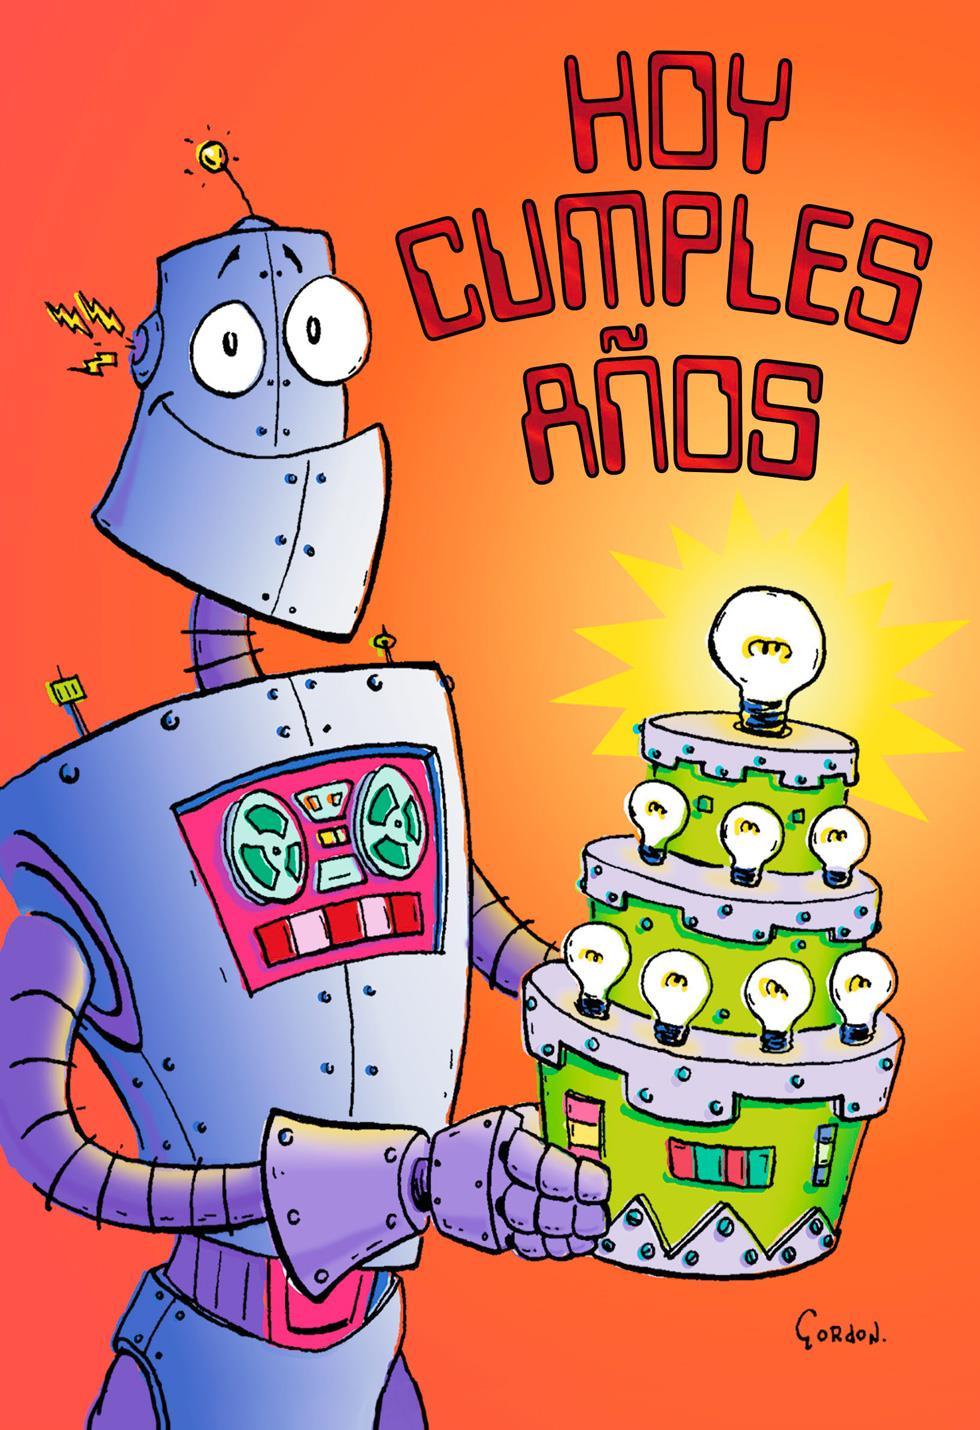 Robot Cake Spanish Language Birthday Card For Child Greeting Cards